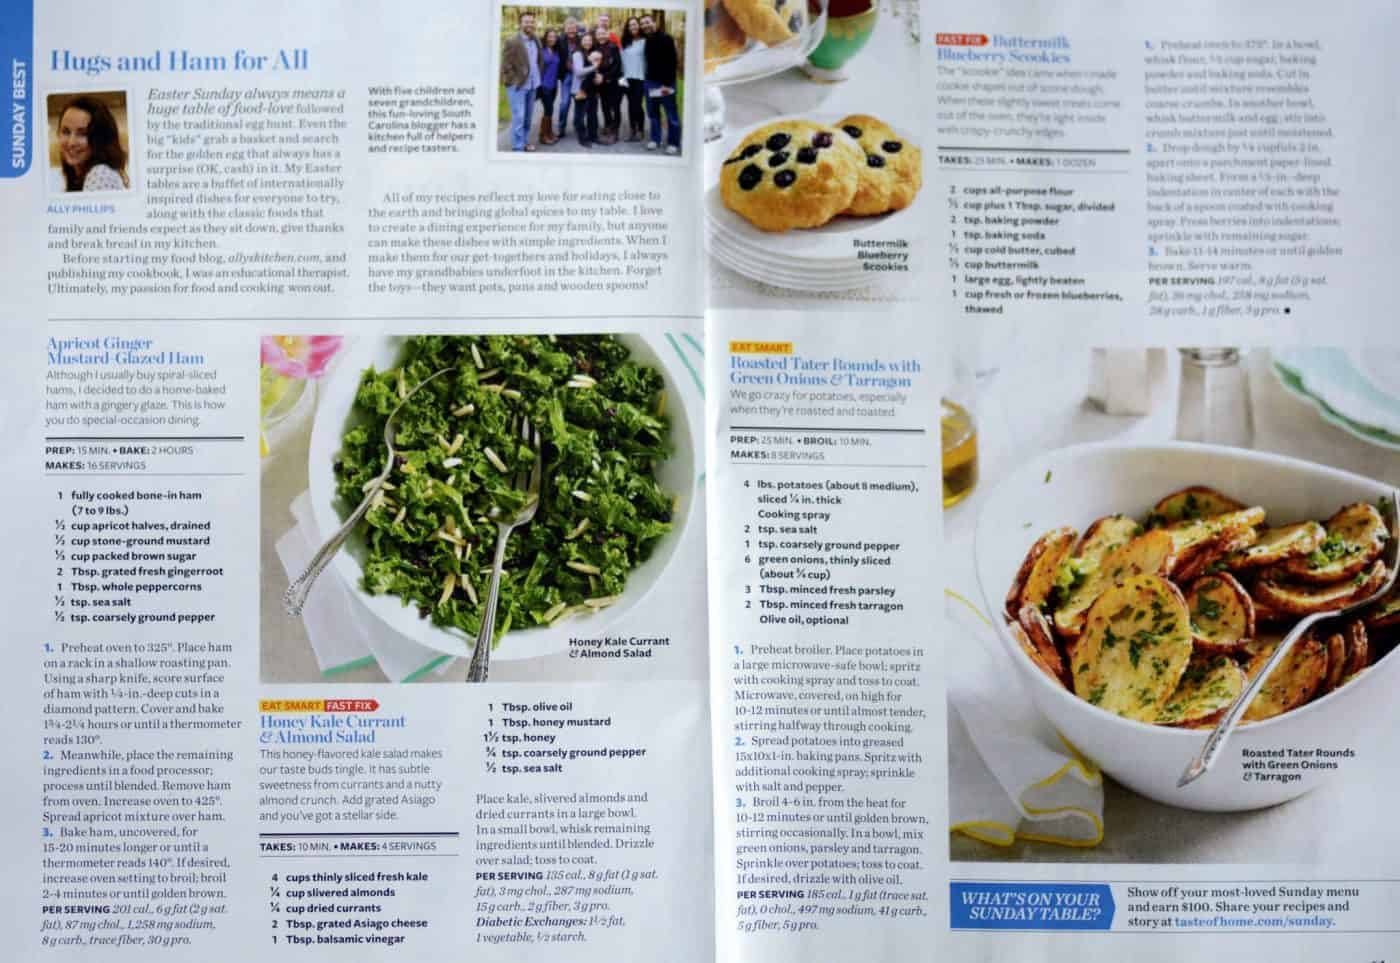 america's #1 food magazine calls me